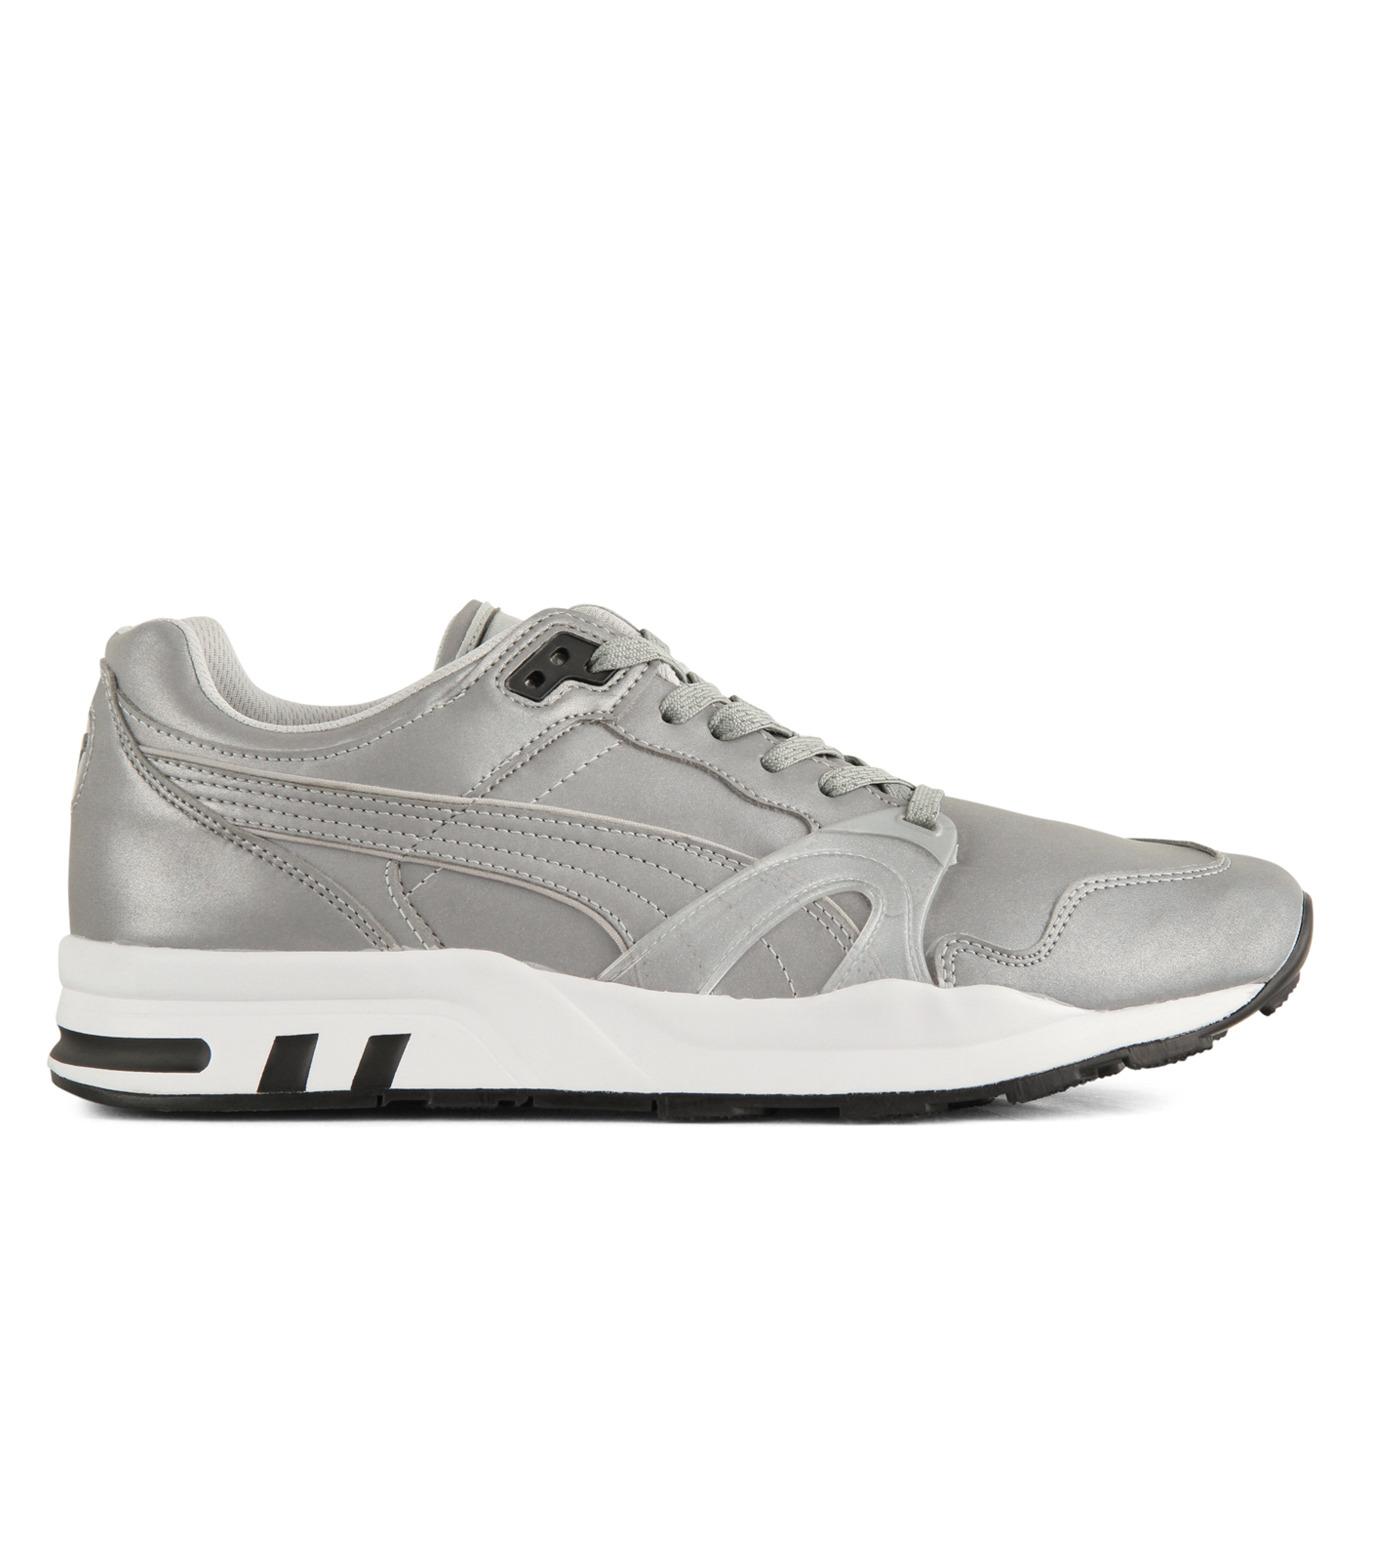 PUMA(プーマ)のXT1 Reflective-WHITE(シューズ/shoes)-358636-4 拡大詳細画像1